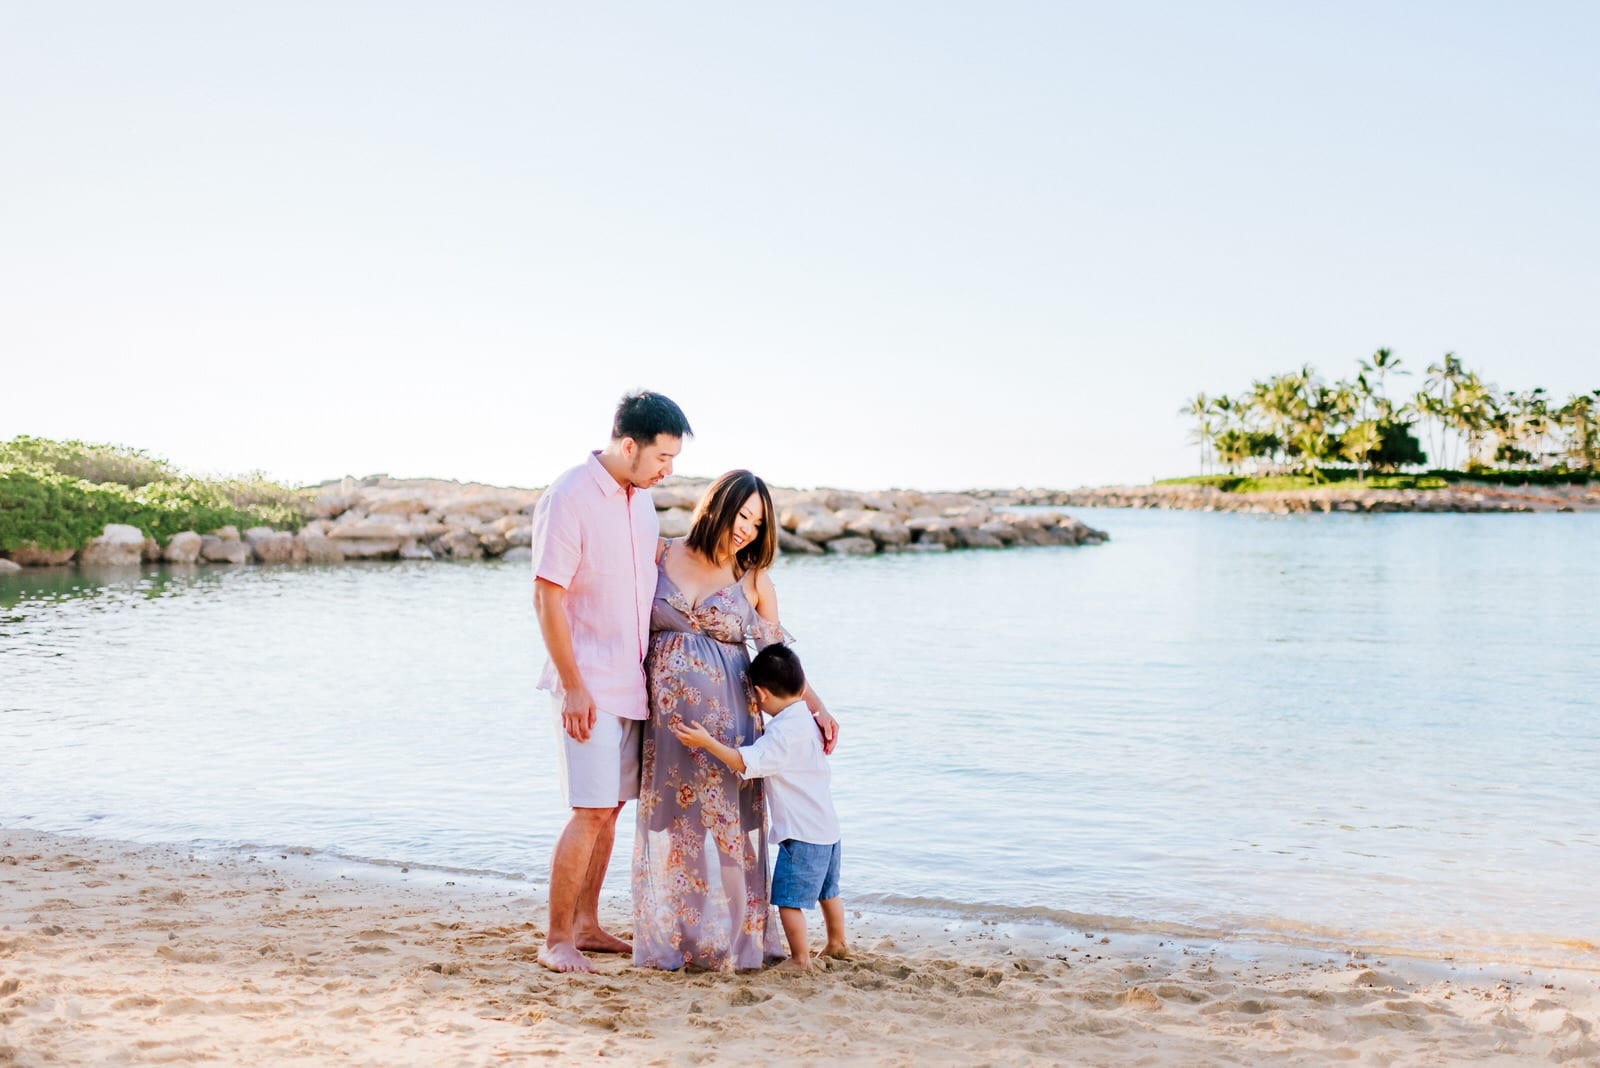 oahu-photographer-family-aulani-resort-3.jpg